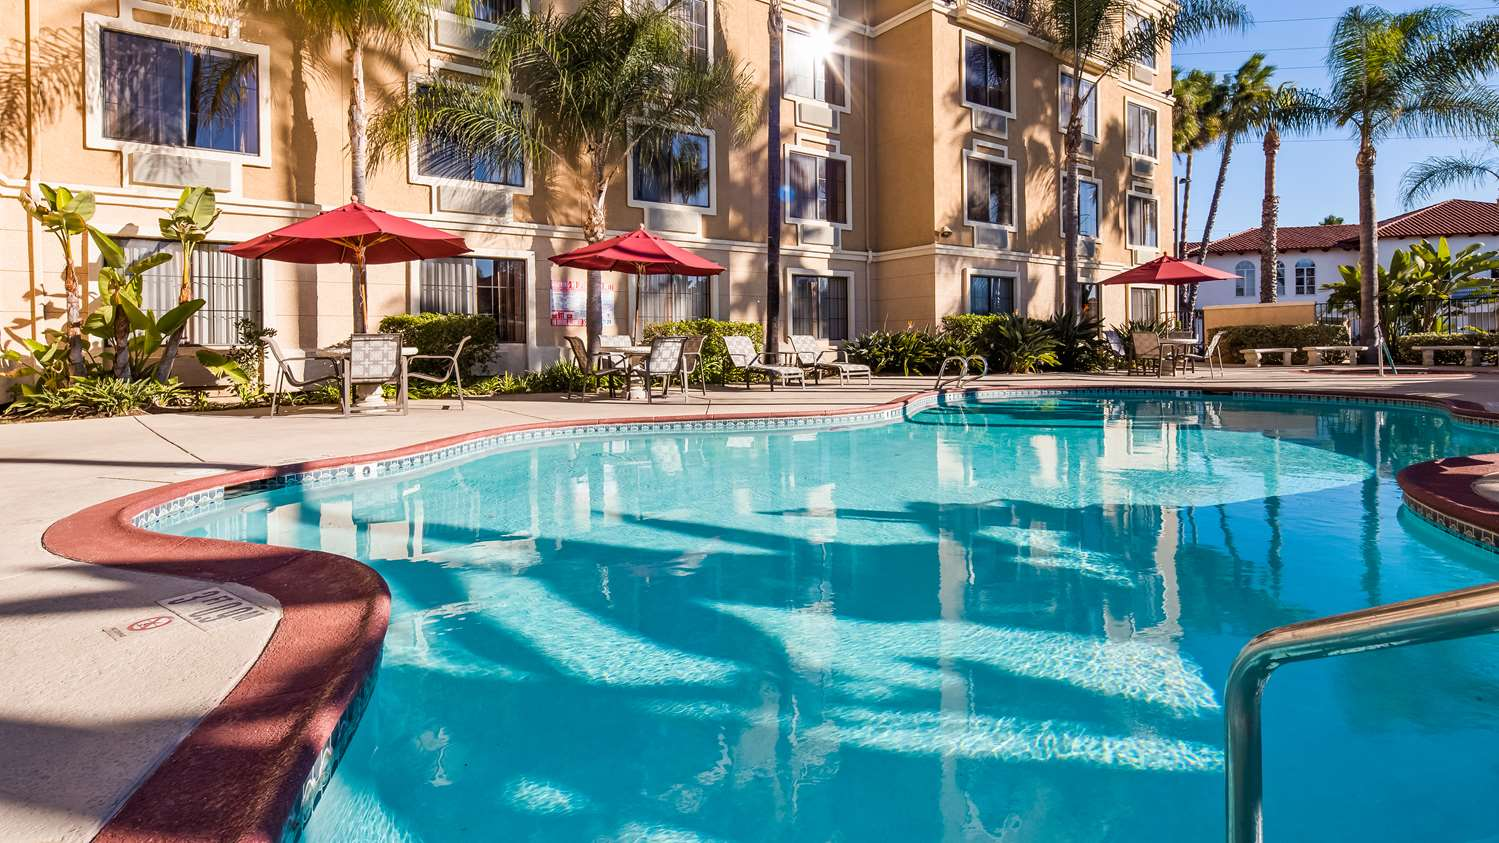 The swimming pool at Best Western Escondido hotel near San Diego Zoo Safari Park